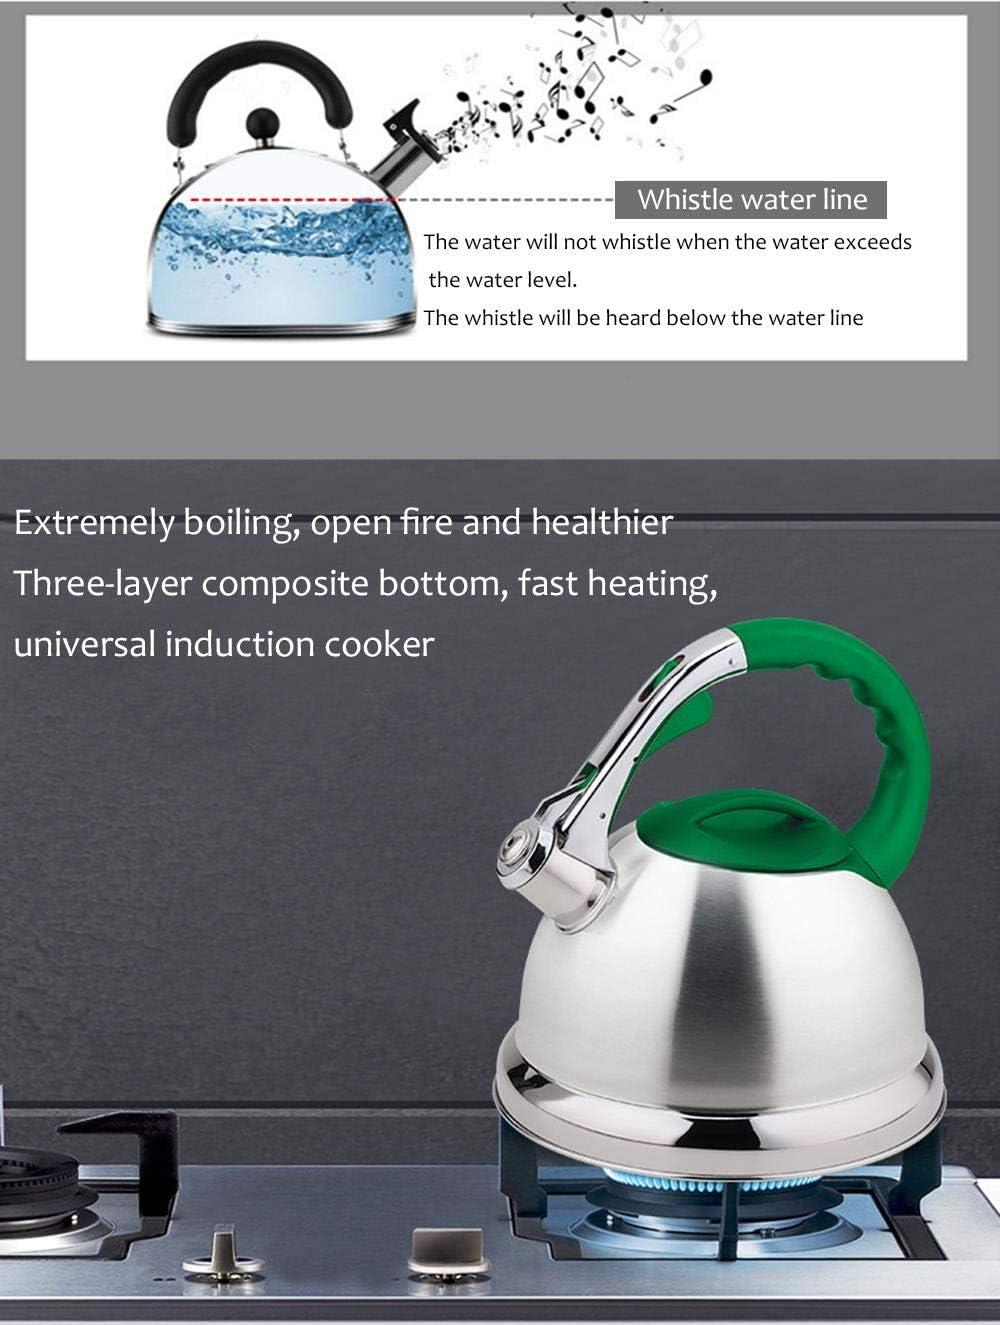 doble fondo acero inoxidable hervidor de agua de 4,5 l de gas Verde estufa universal hervidor de agua hirviendo Whistling Kettle casa o viajes al aire libre